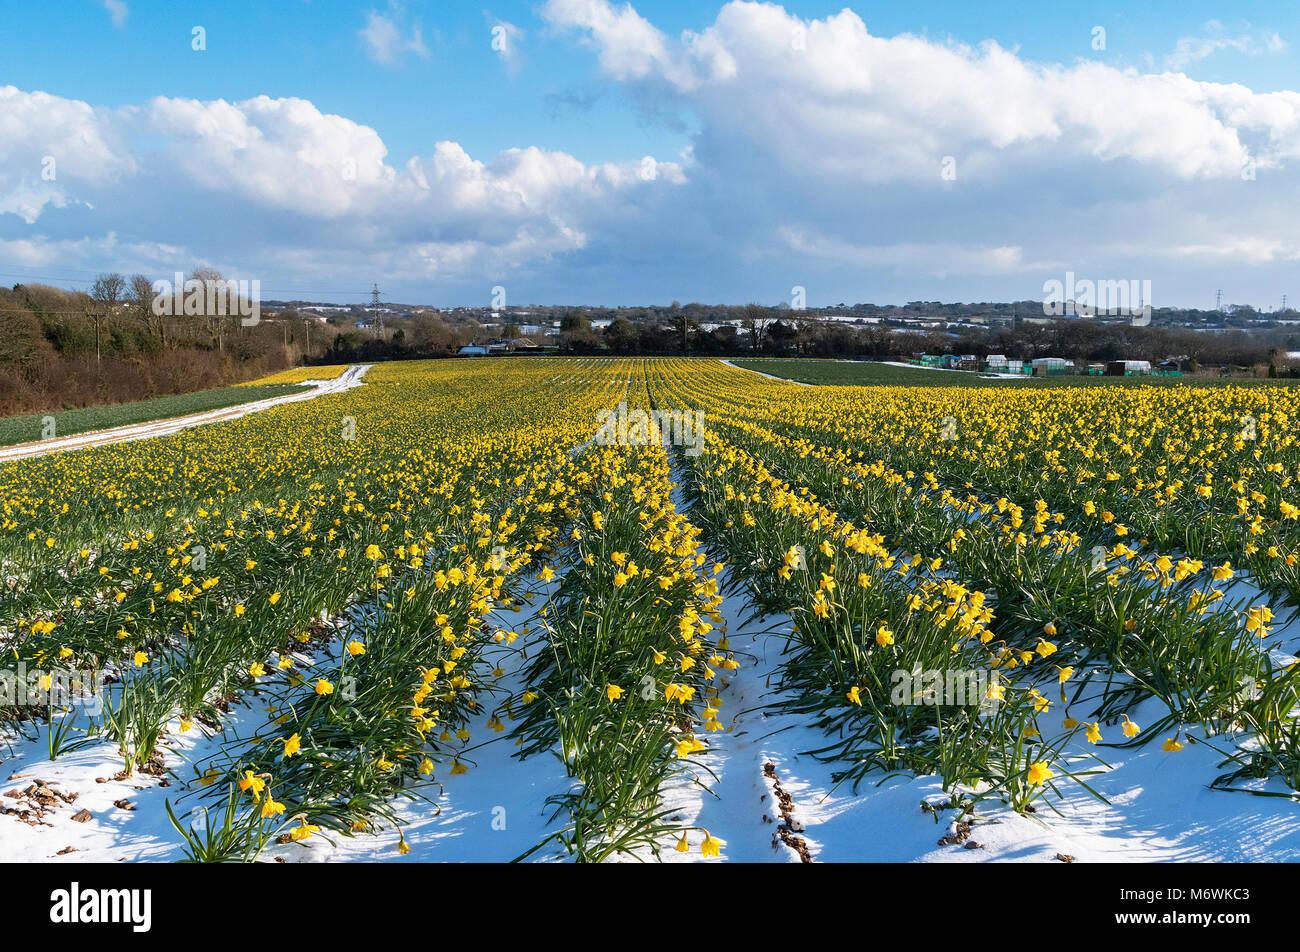 snow in the daffodil fields near truro, cornwall, england, britain, uk. - Stock Image